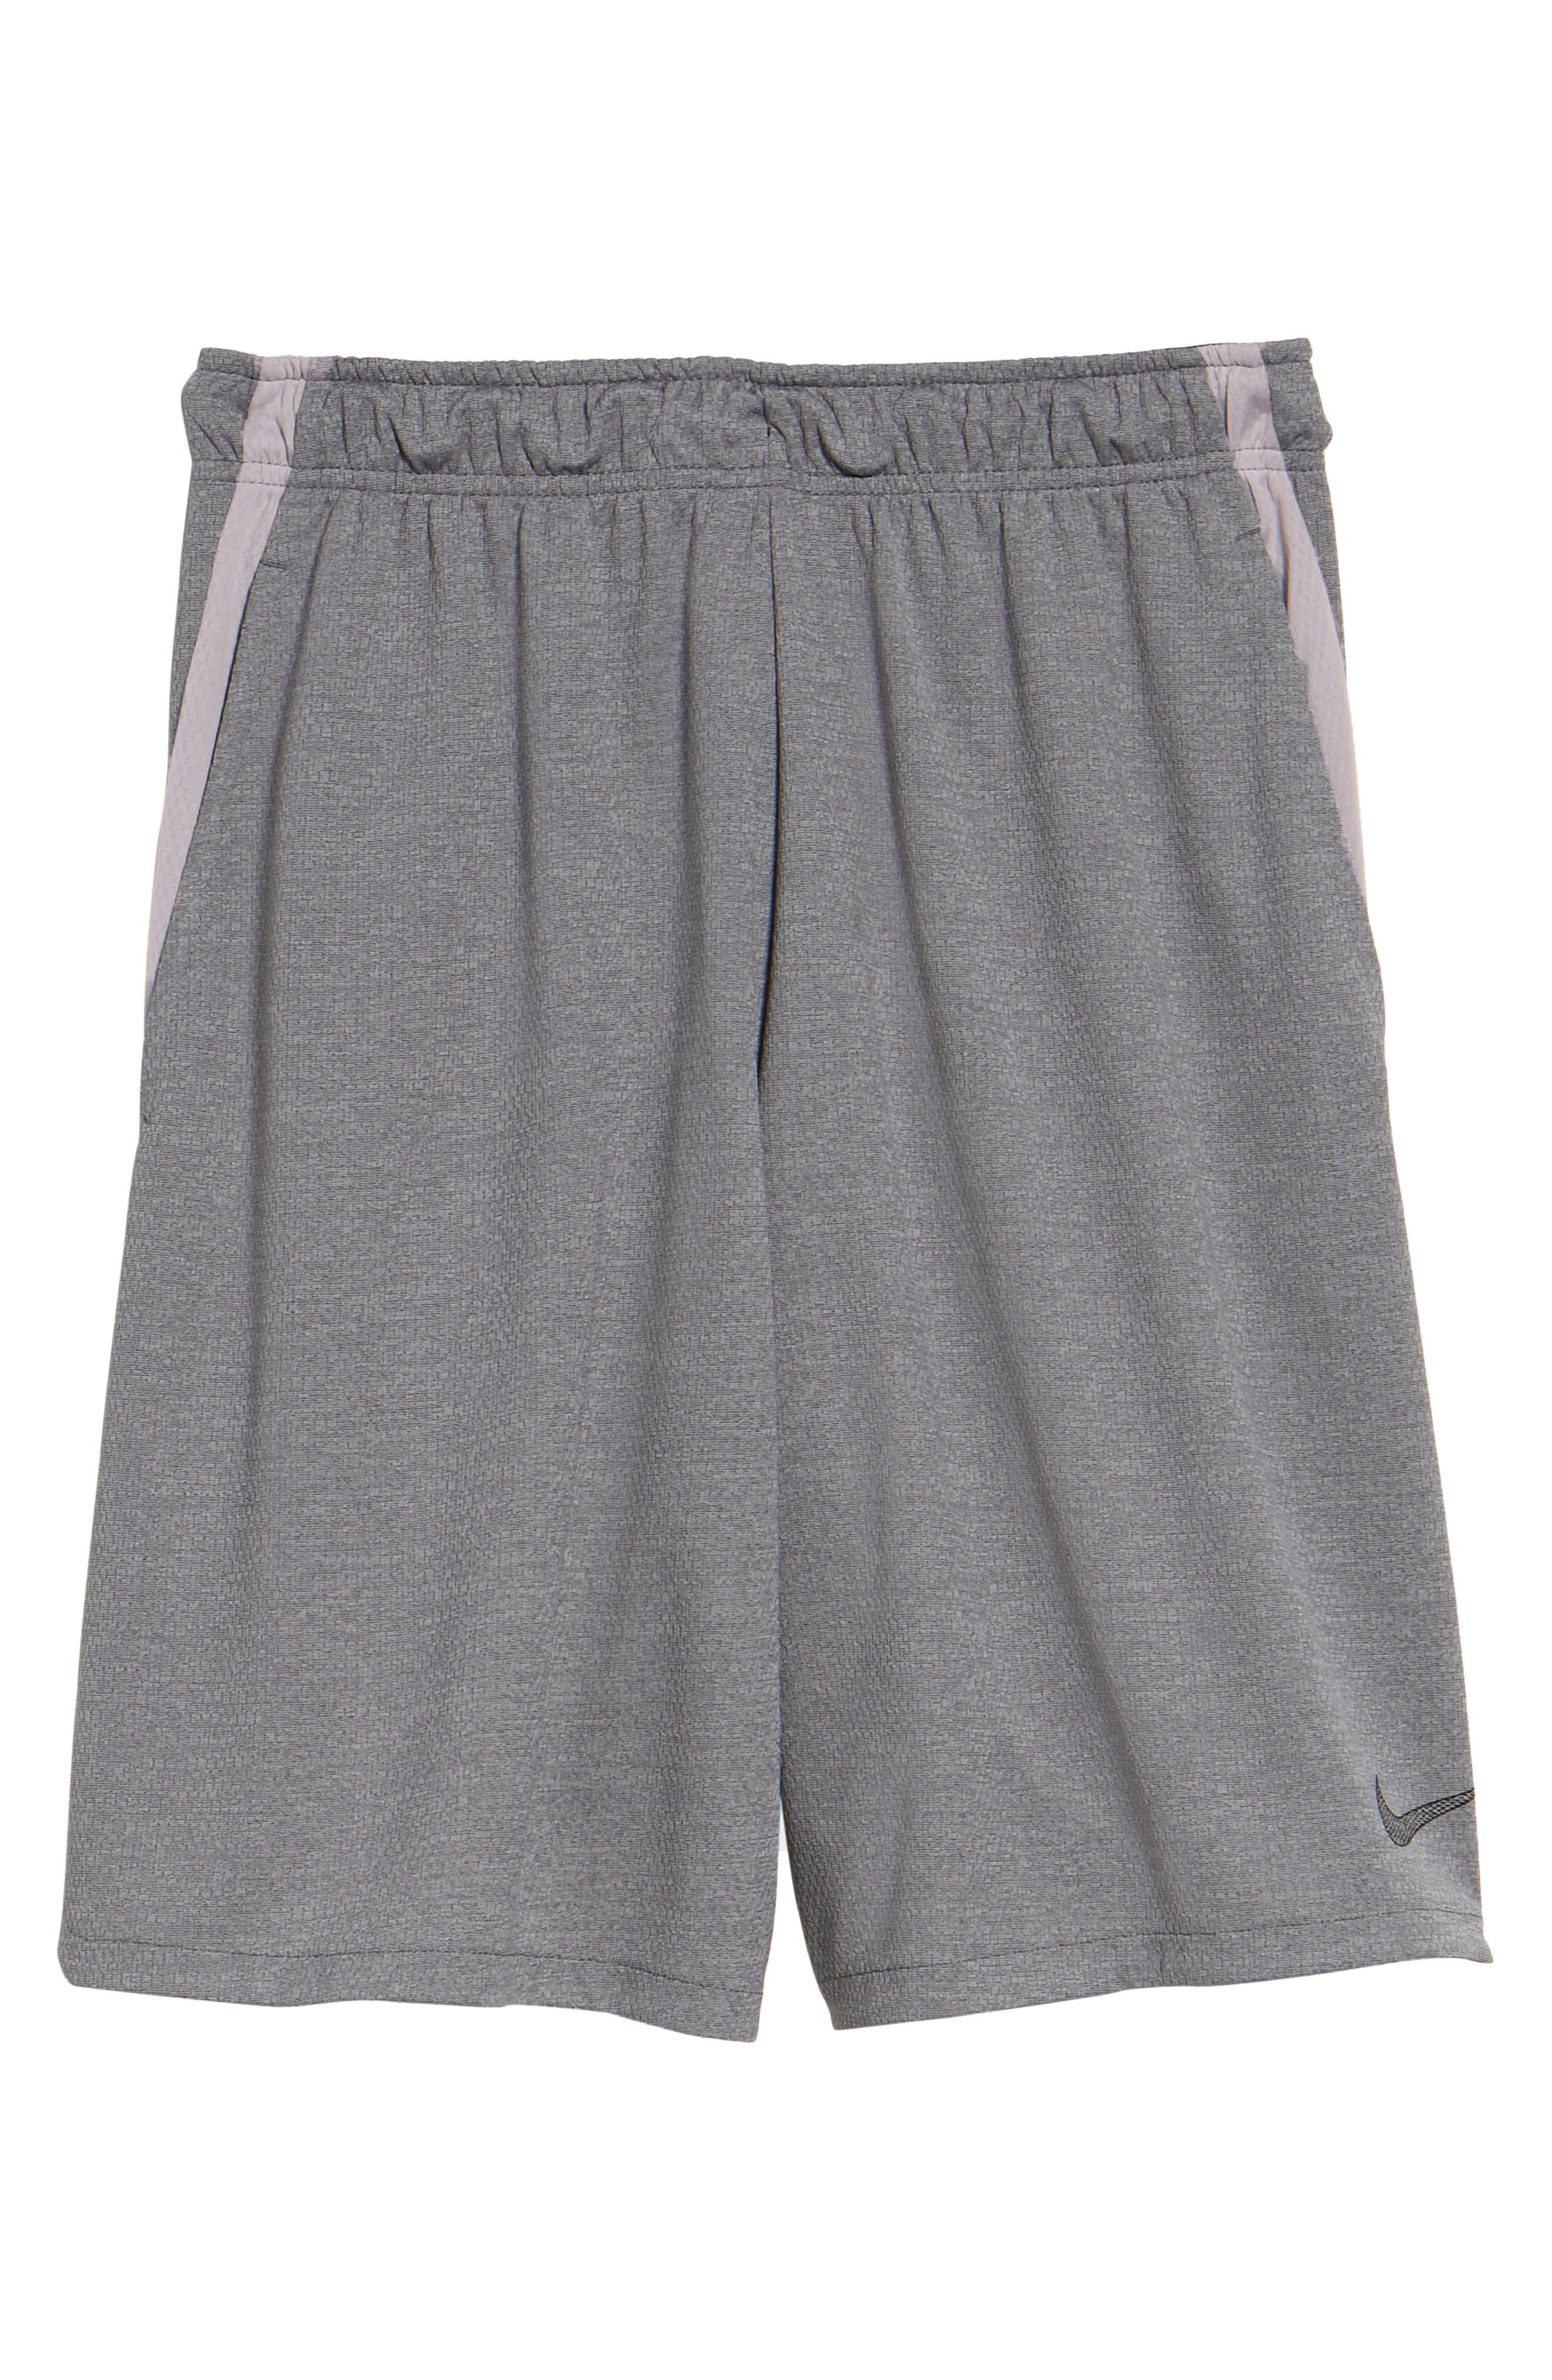 Training Dry 4.0 Shorts,                             Alternate thumbnail 32, color,